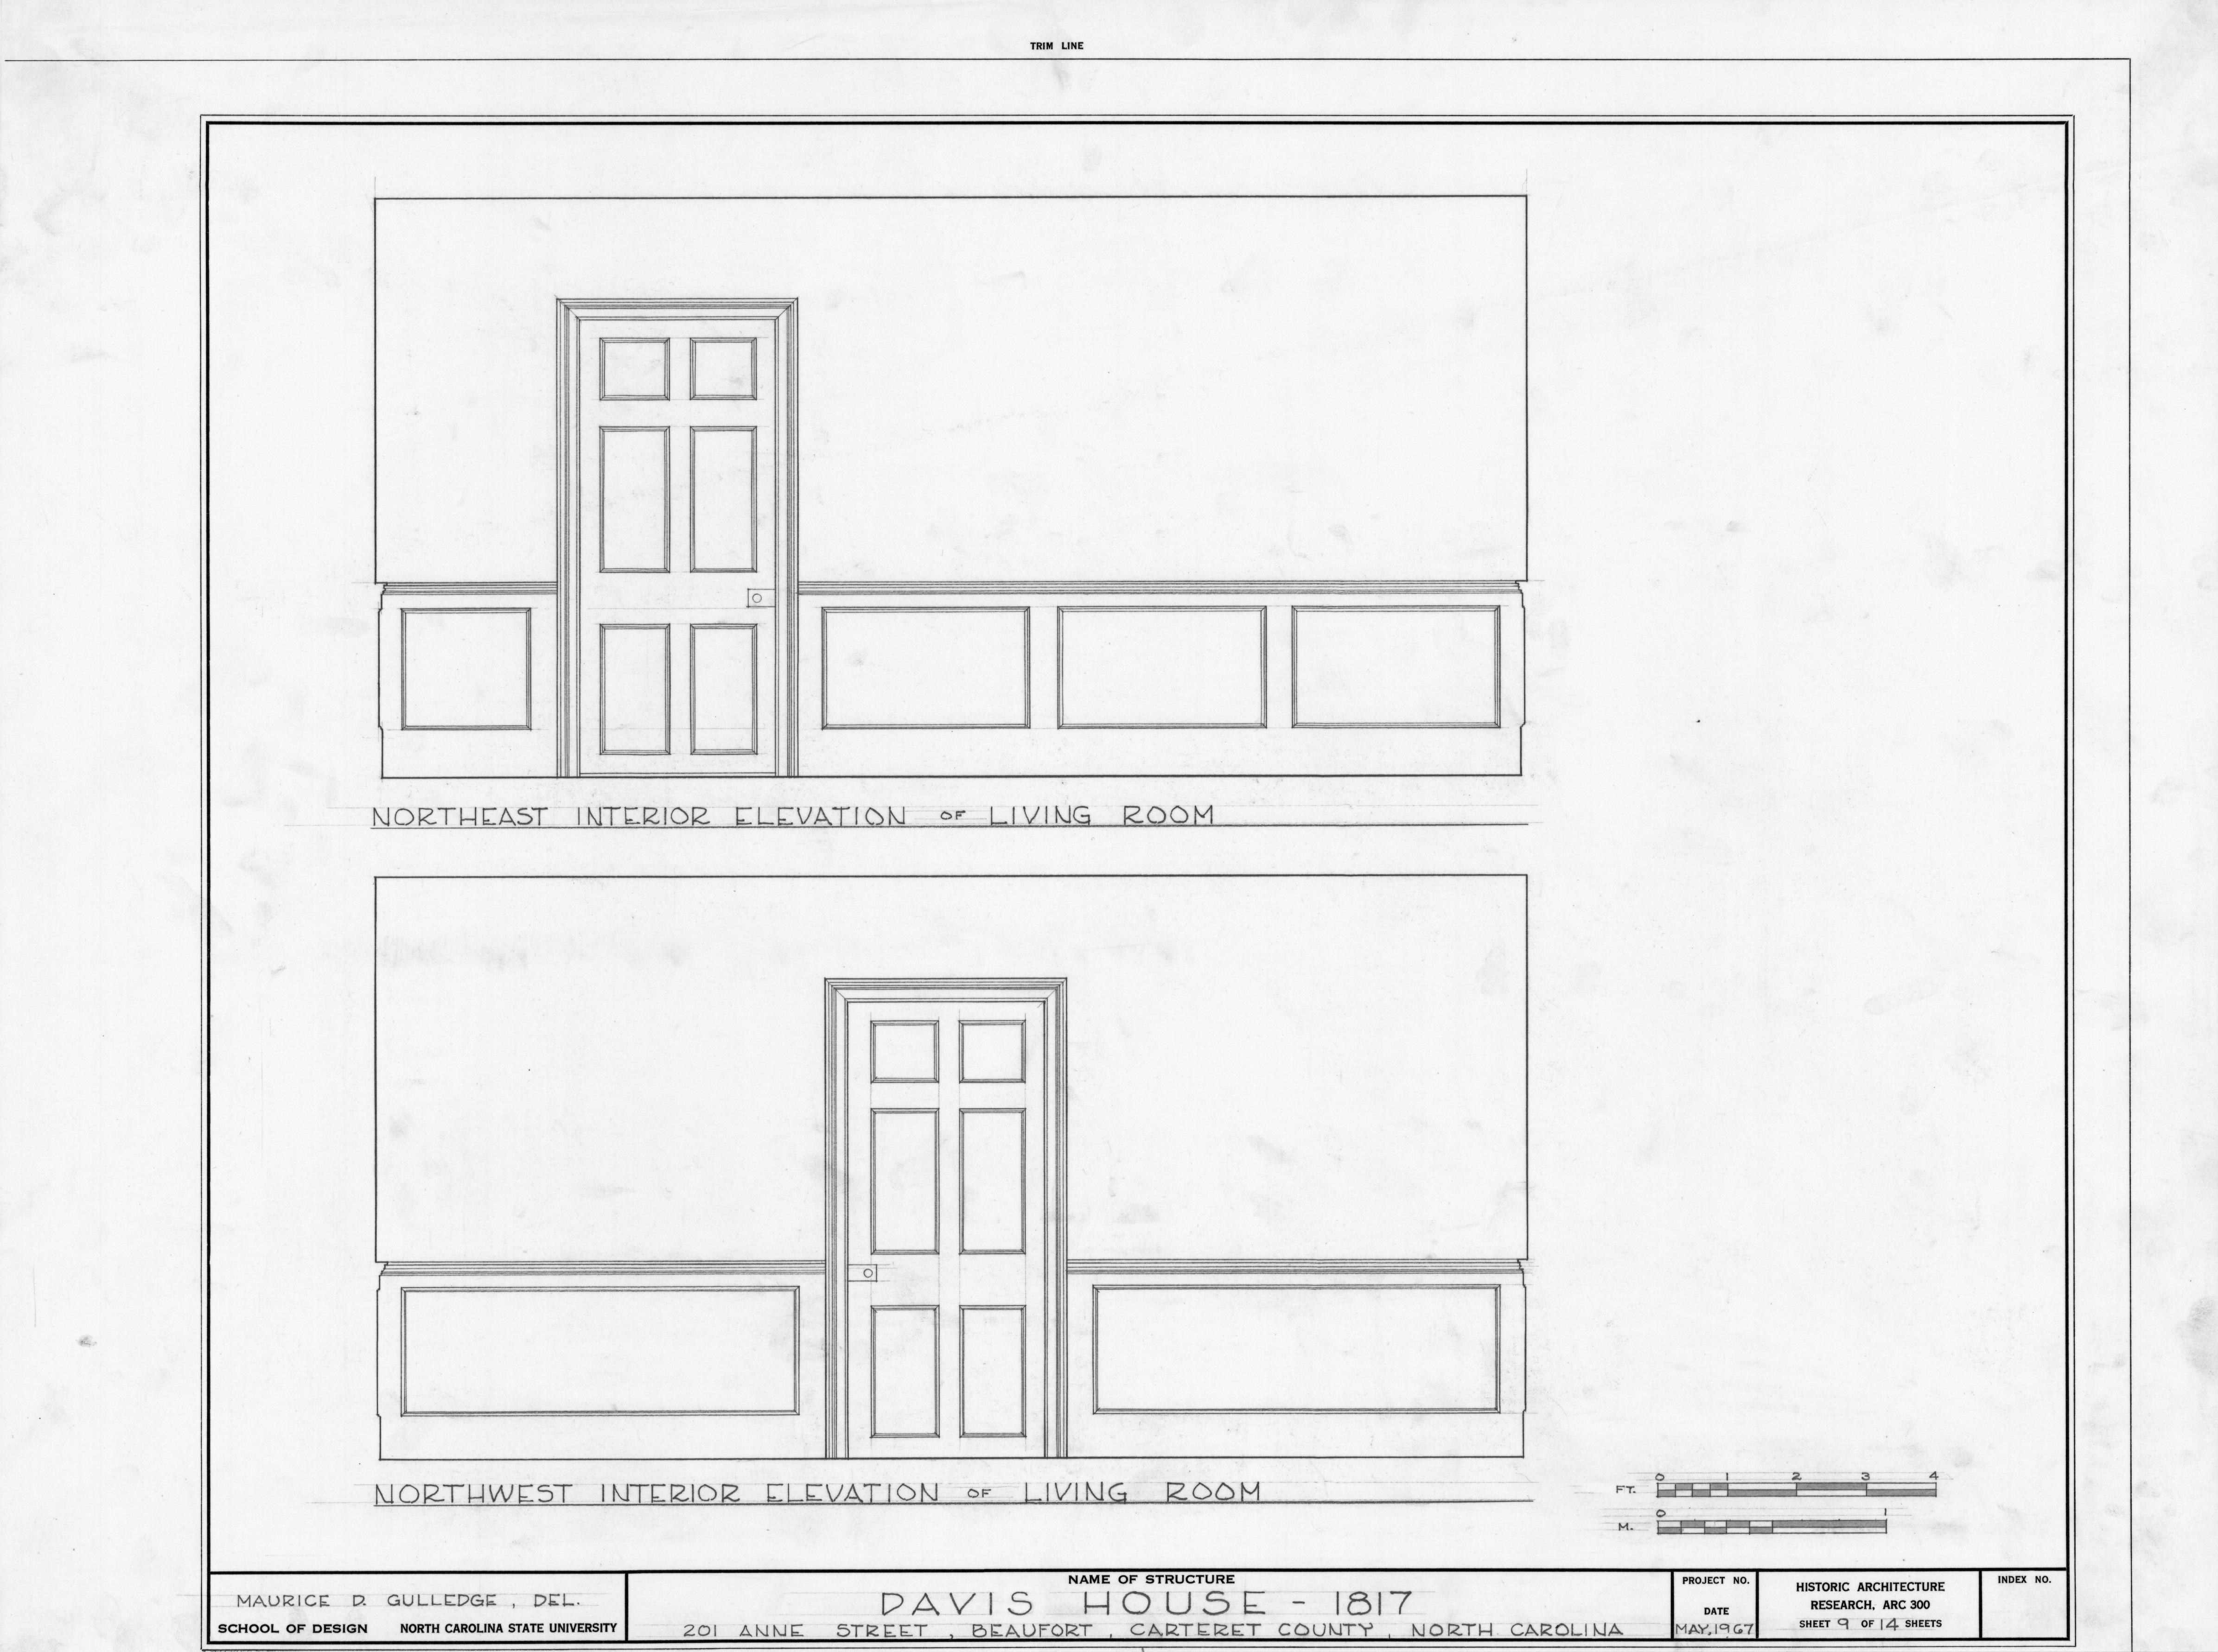 Living room interior elevations davis house beaufort for Living room elevation